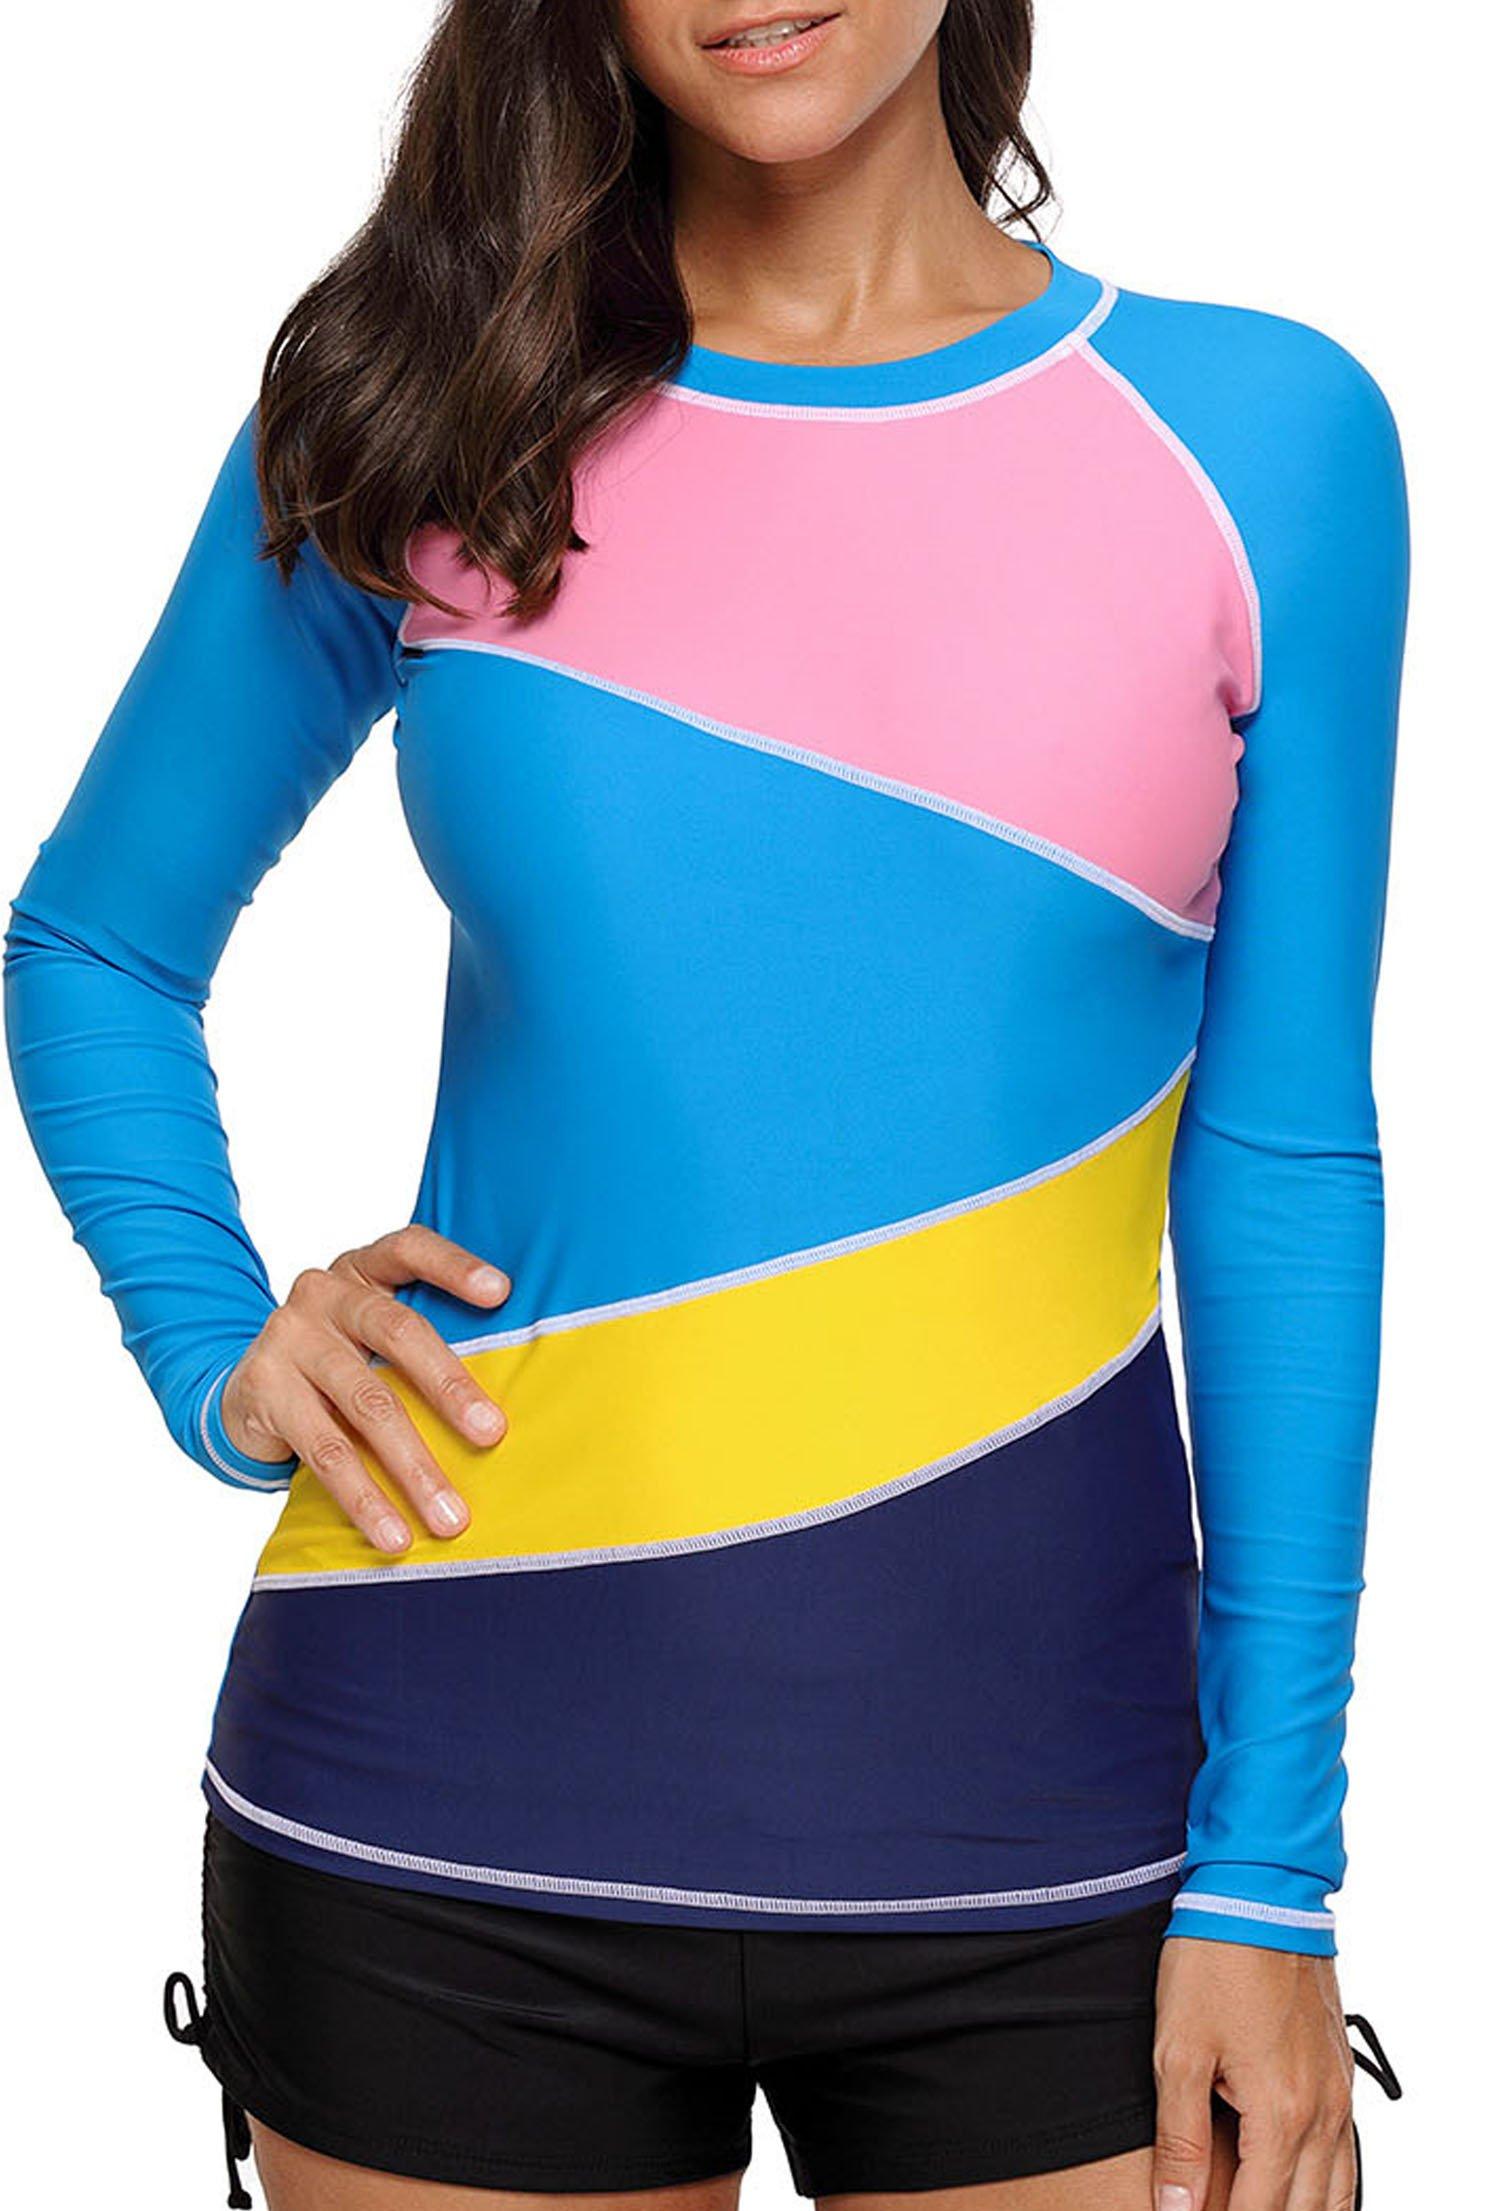 Aleumdr Womens Long Sleeve Rashguard Swimwear Printed Rash Guard Wetsuit Athletic Tops Surfing Shirt Swimsuit No Bottoms